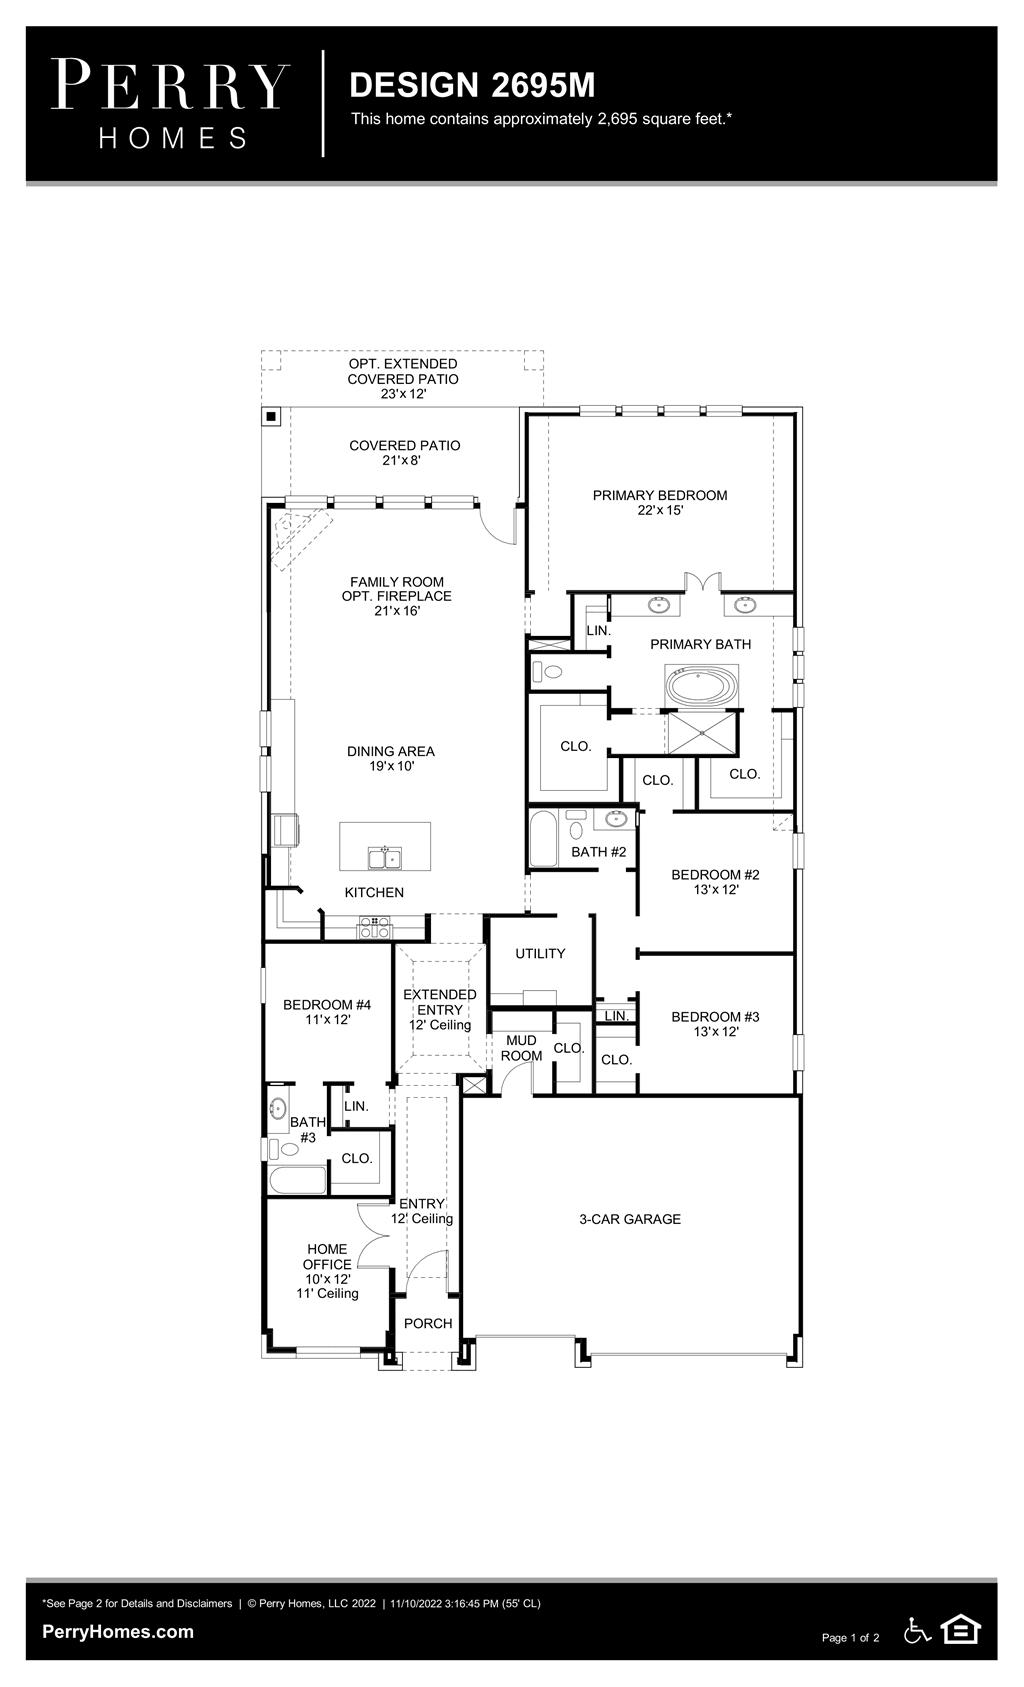 Floor Plan for 2695M